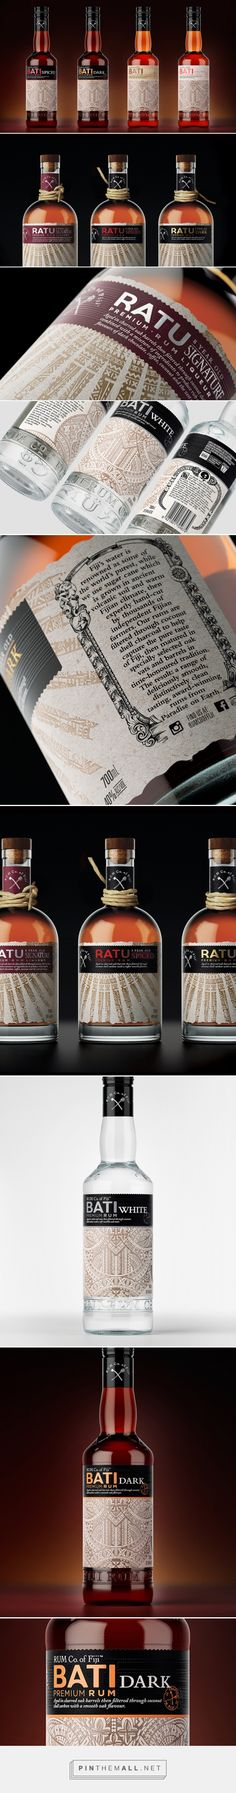 Rum Co. of Fiji packaging design by The Creative Method - http://www.packagingoftheworld.com/2017/09/rum-co-of-fiji-rebrand.html